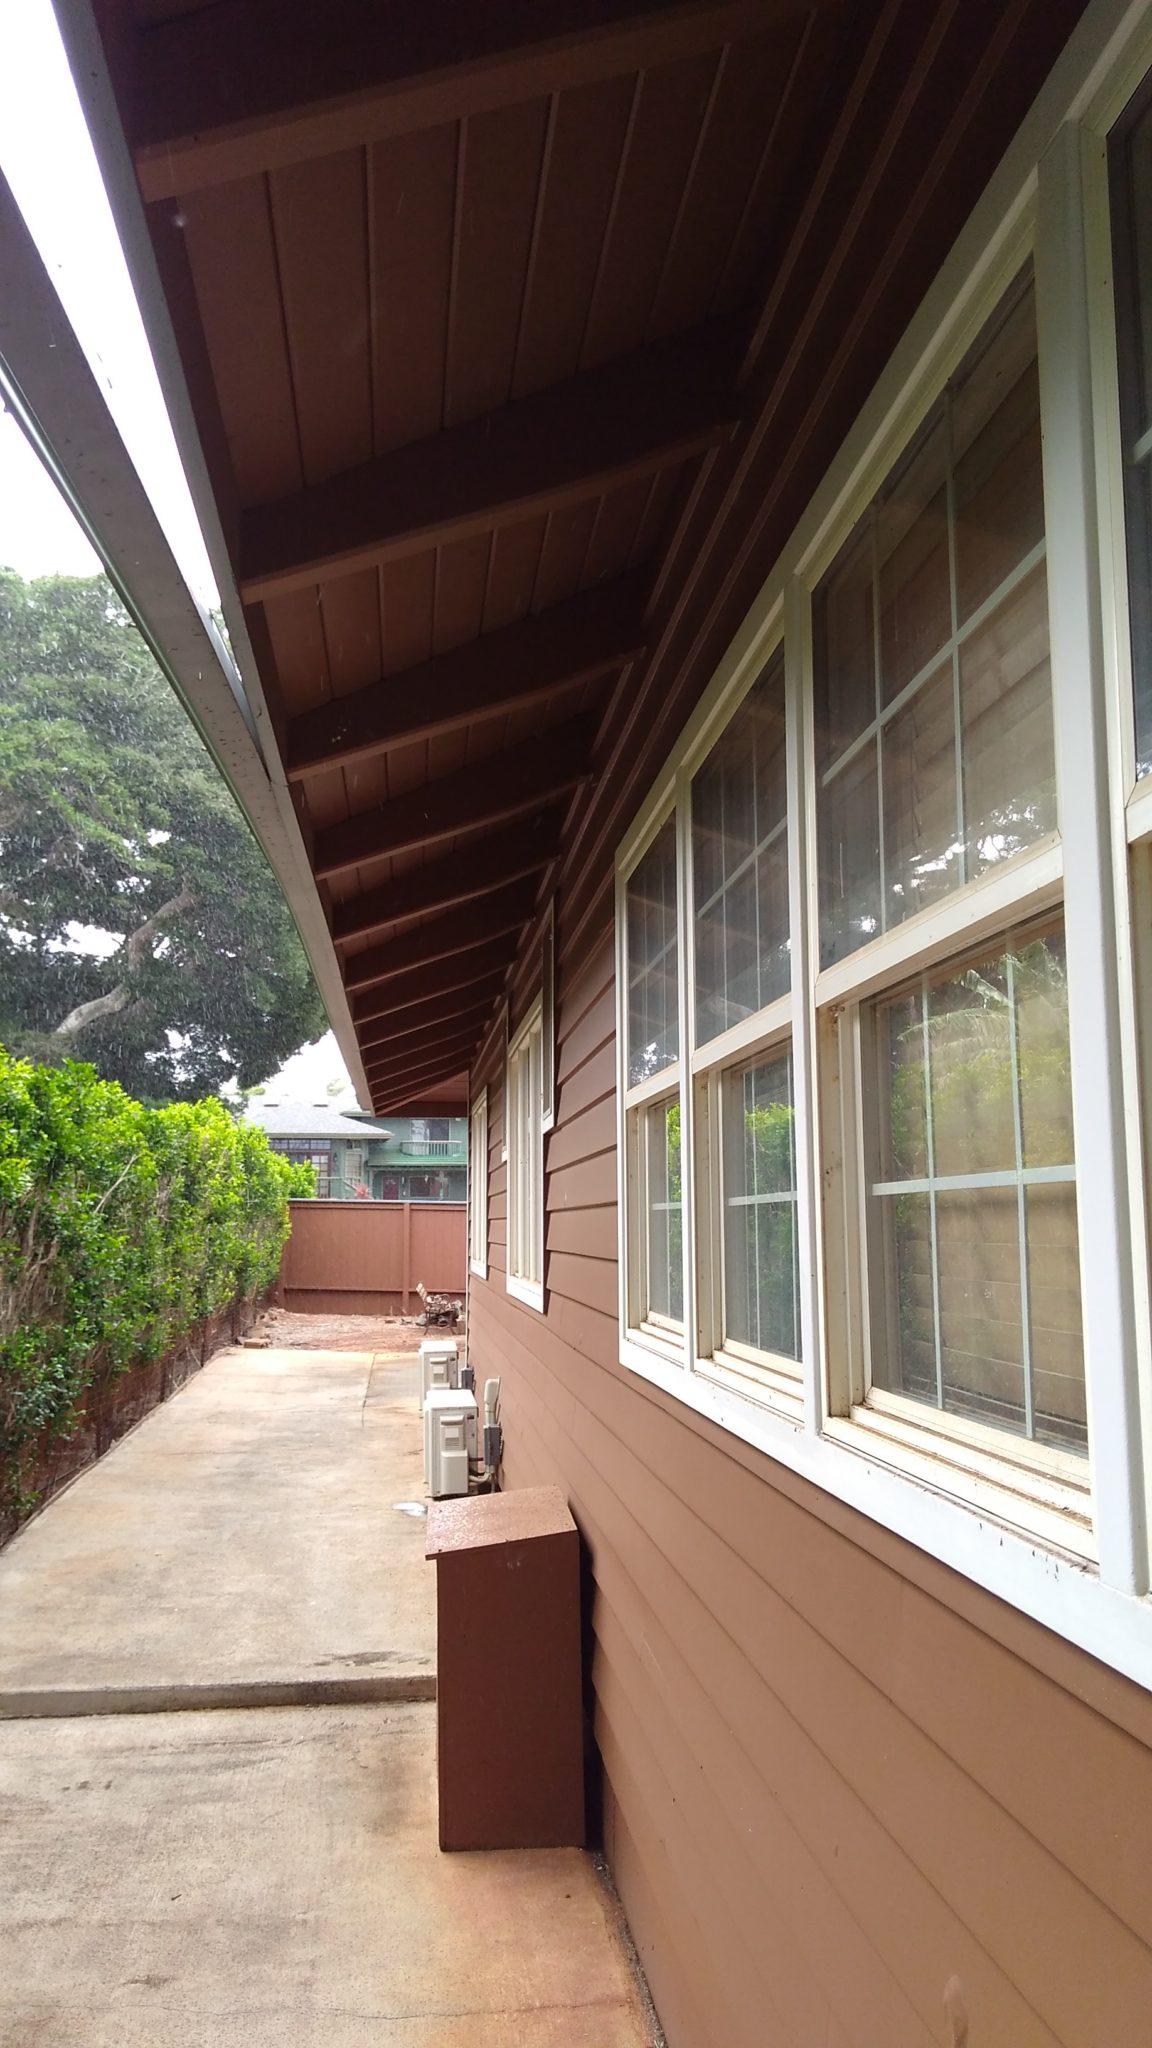 Maui Window Cleaning